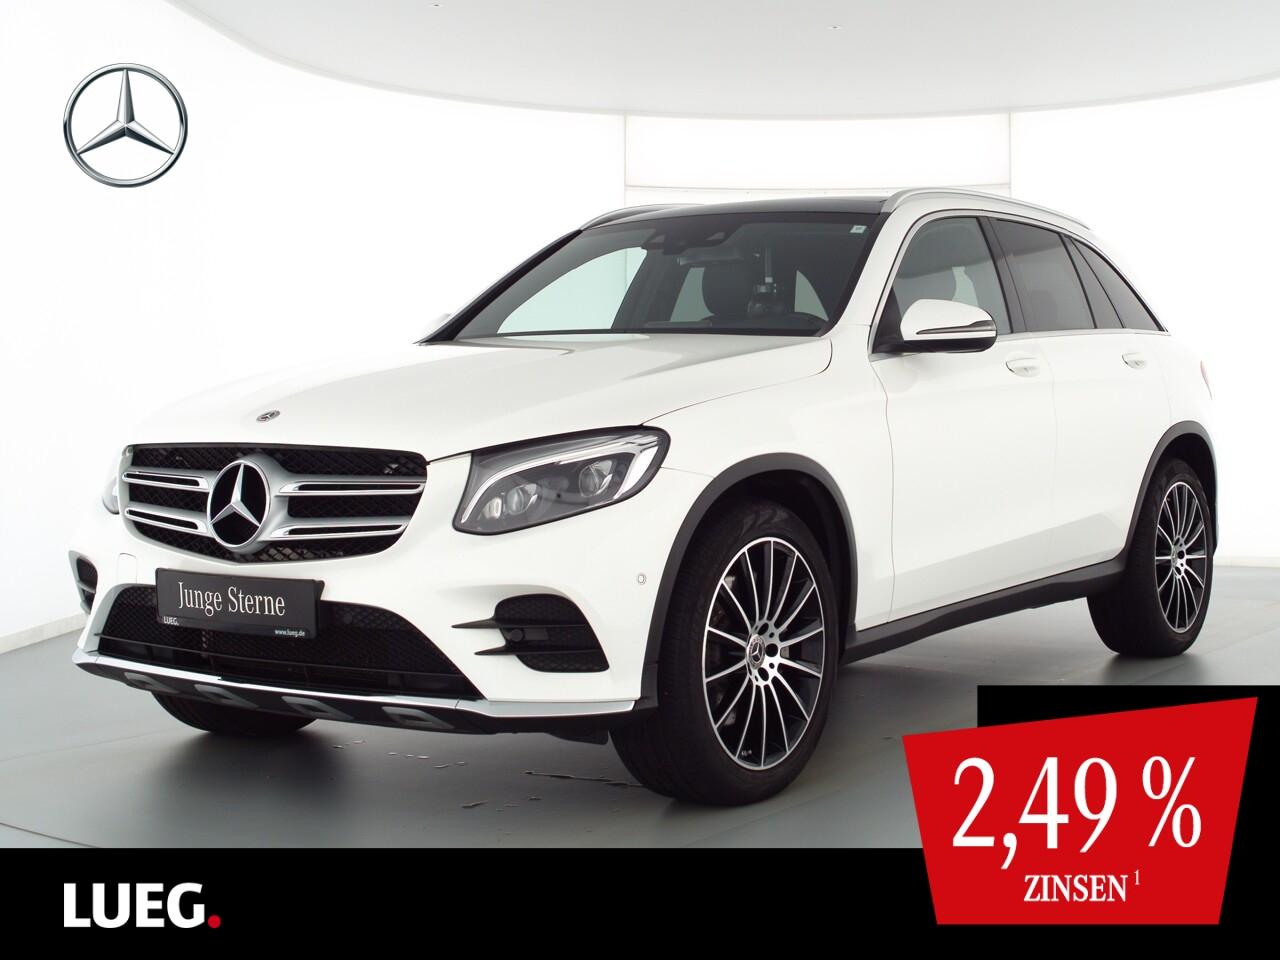 Mercedes-Benz GLC 250 4M AMG+COM+Pano+Burm+LED-ILS+20+Sthzg+RK, Jahr 2018, Benzin